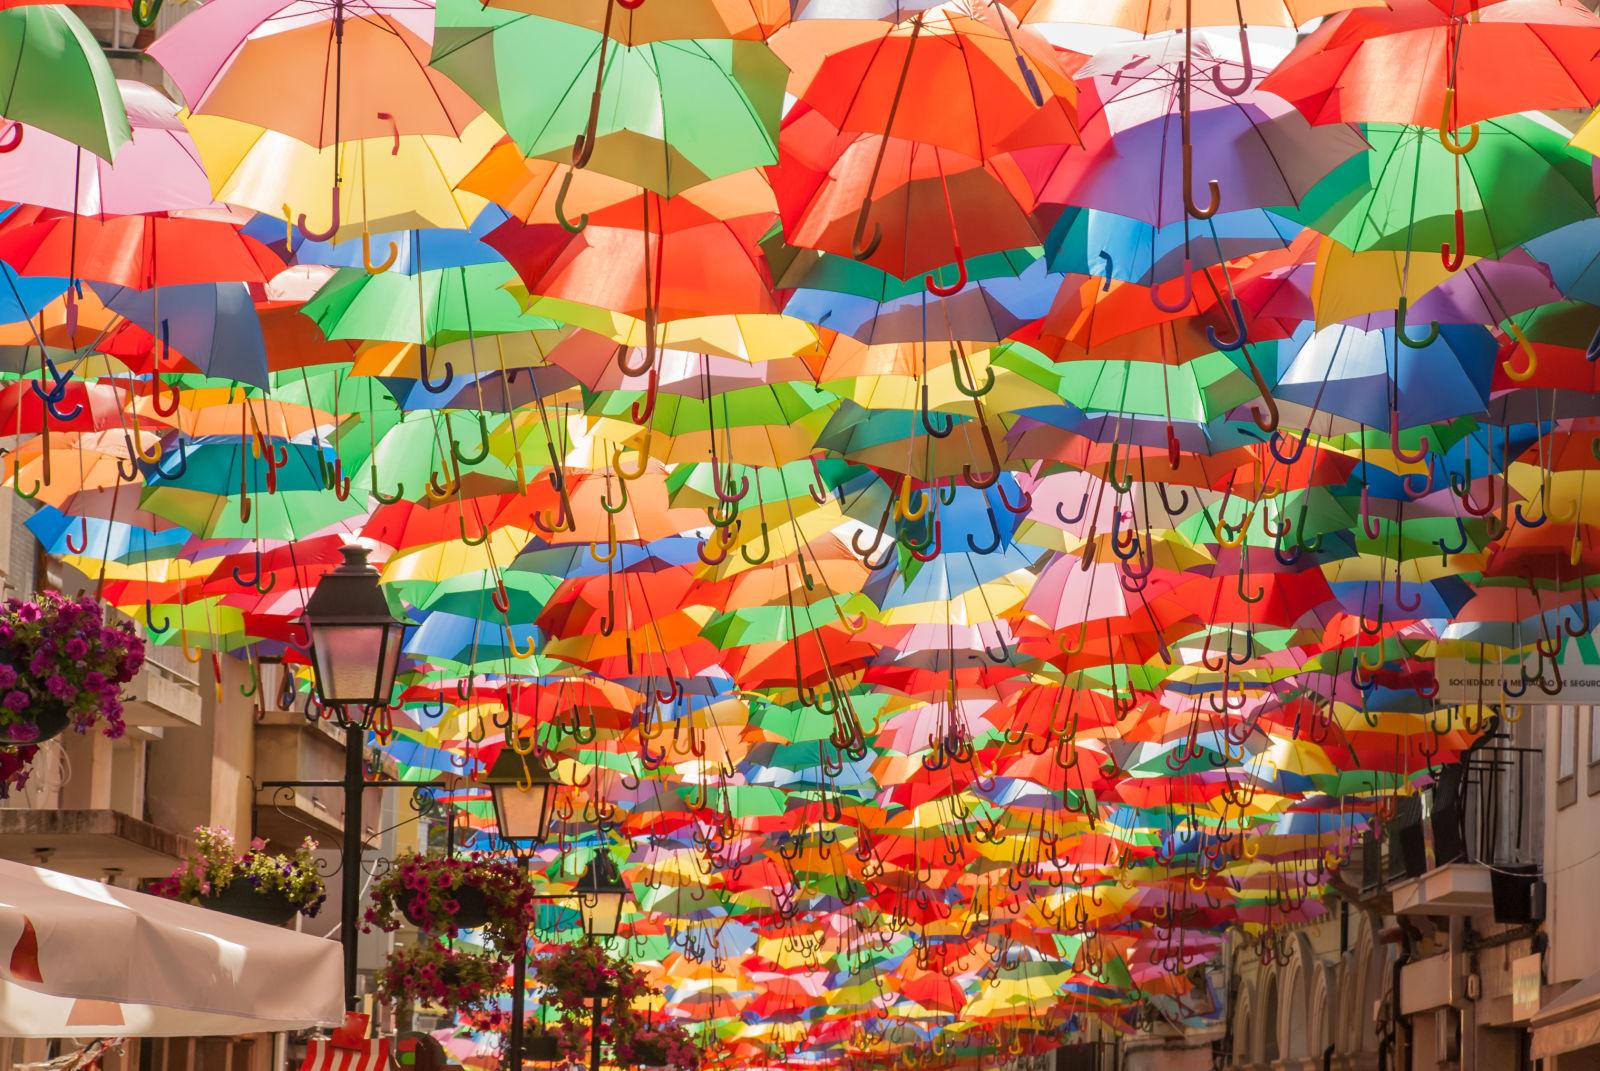 algarve, portugal, umbrella